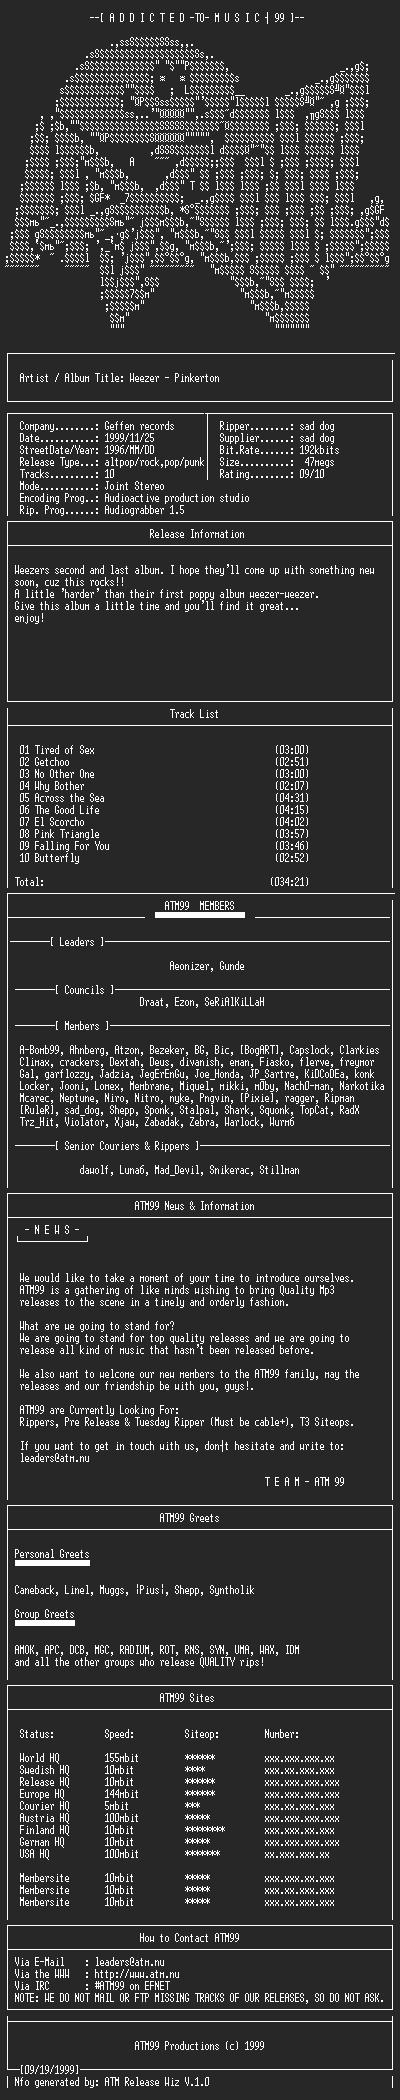 NFO file for Weezer_-_Pinkerton_-_(1996)-ATM99